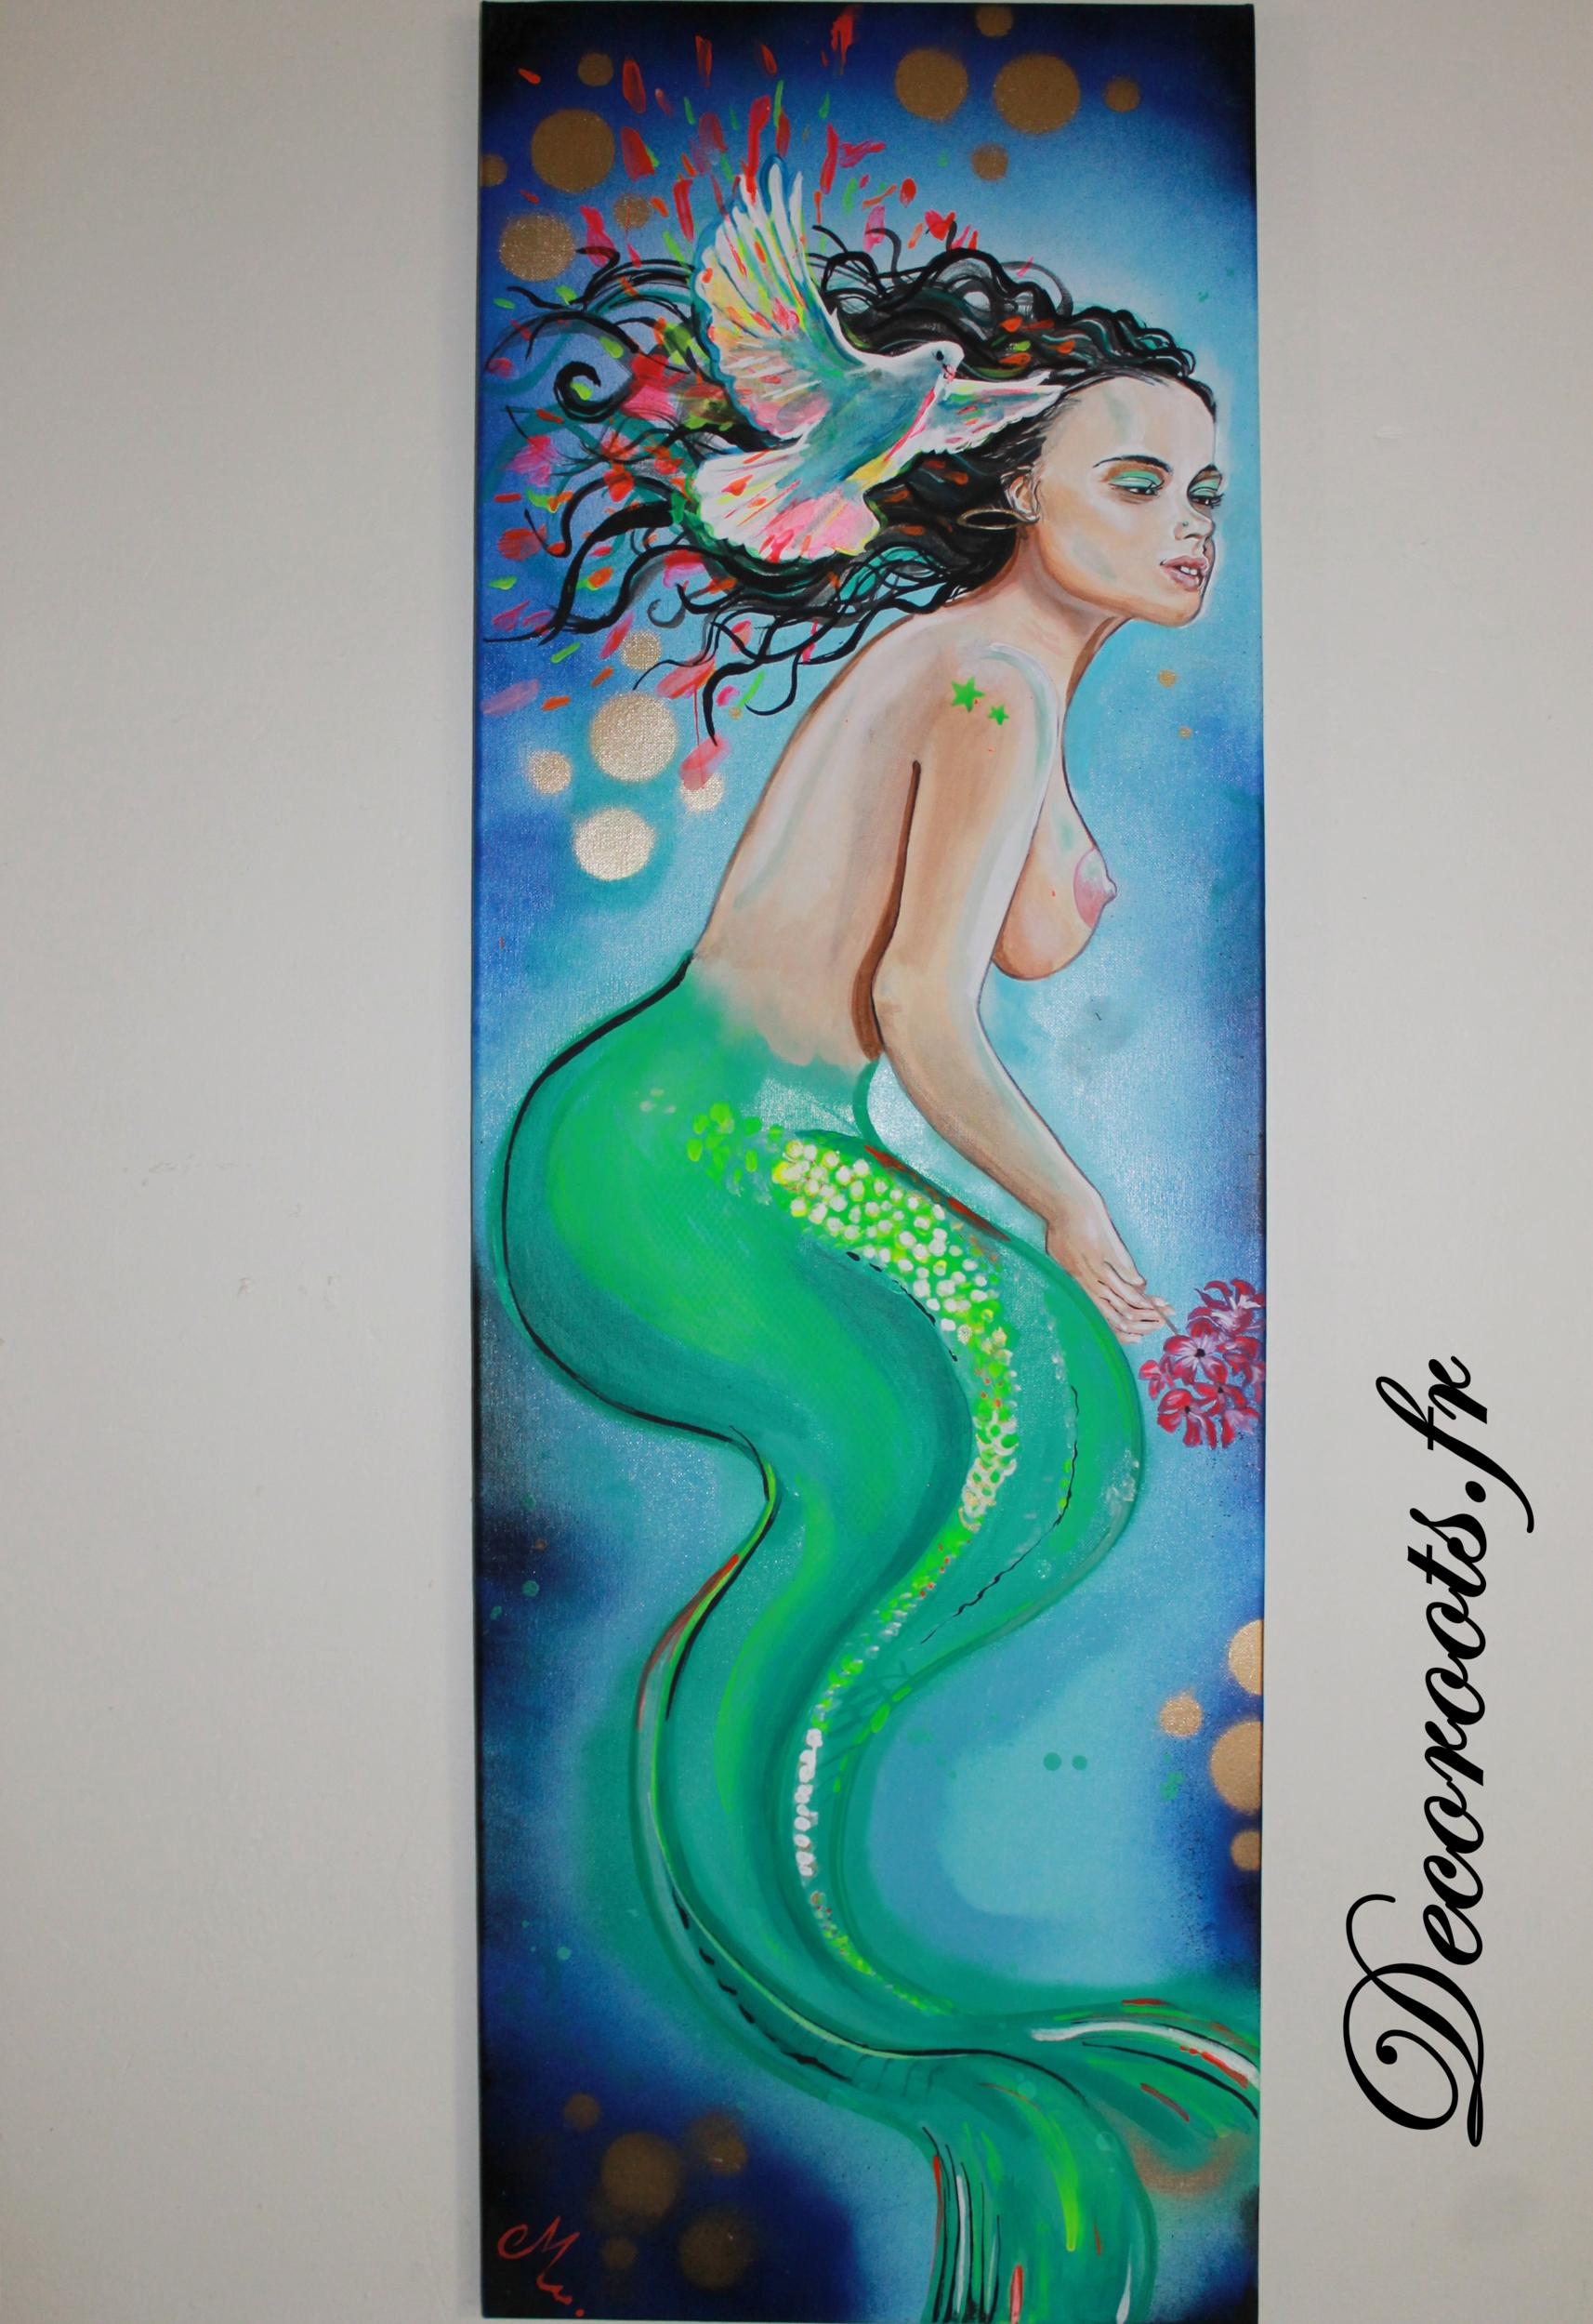 tableau art artiste contemporain moderne sirène mer colombe paix fluo 2